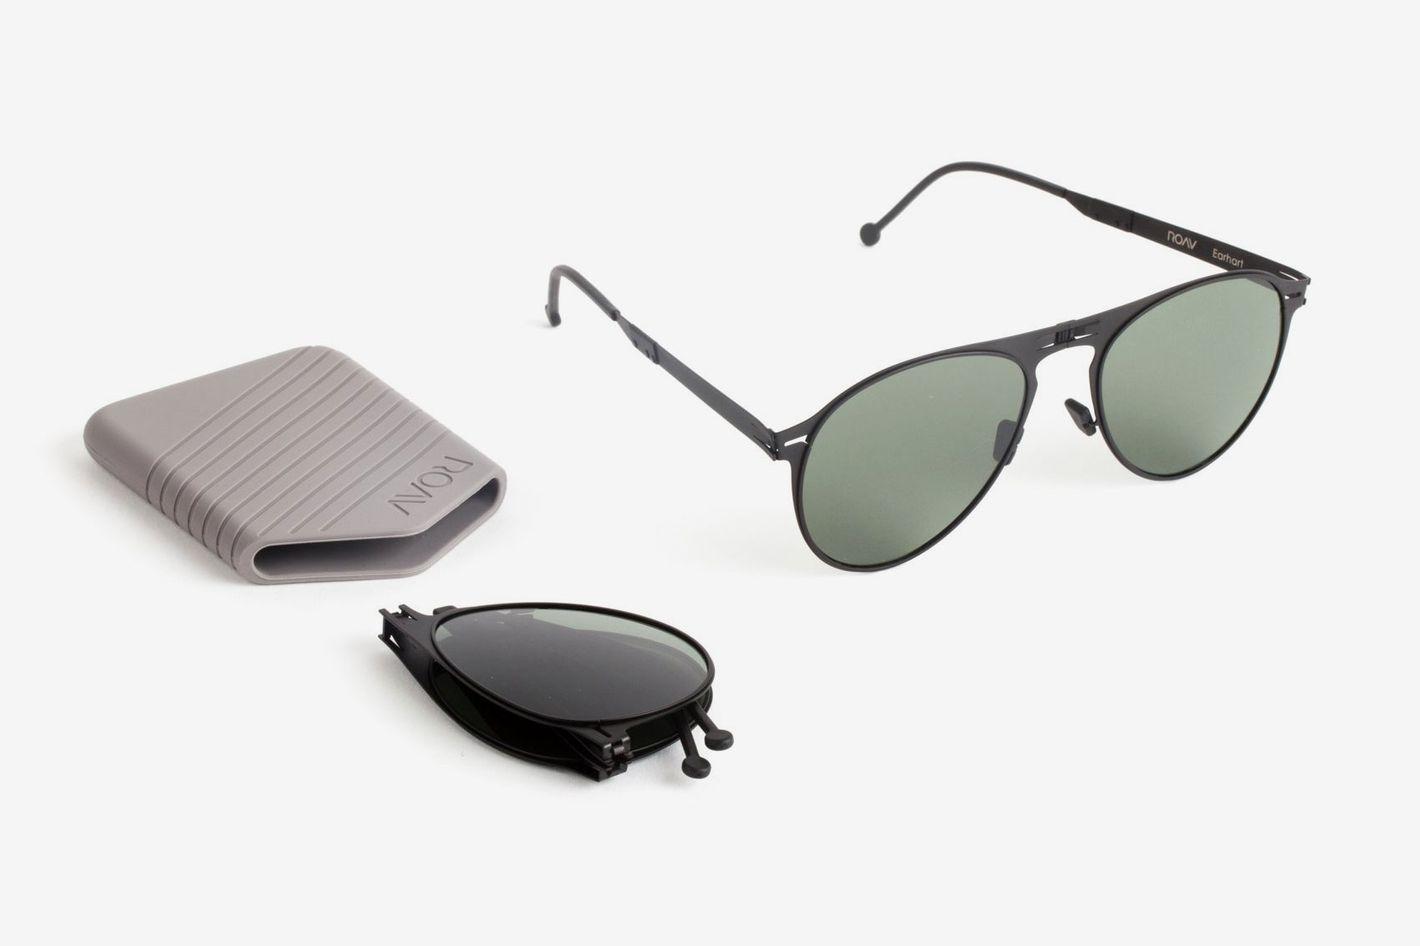 Roav Earhart Sunglasses